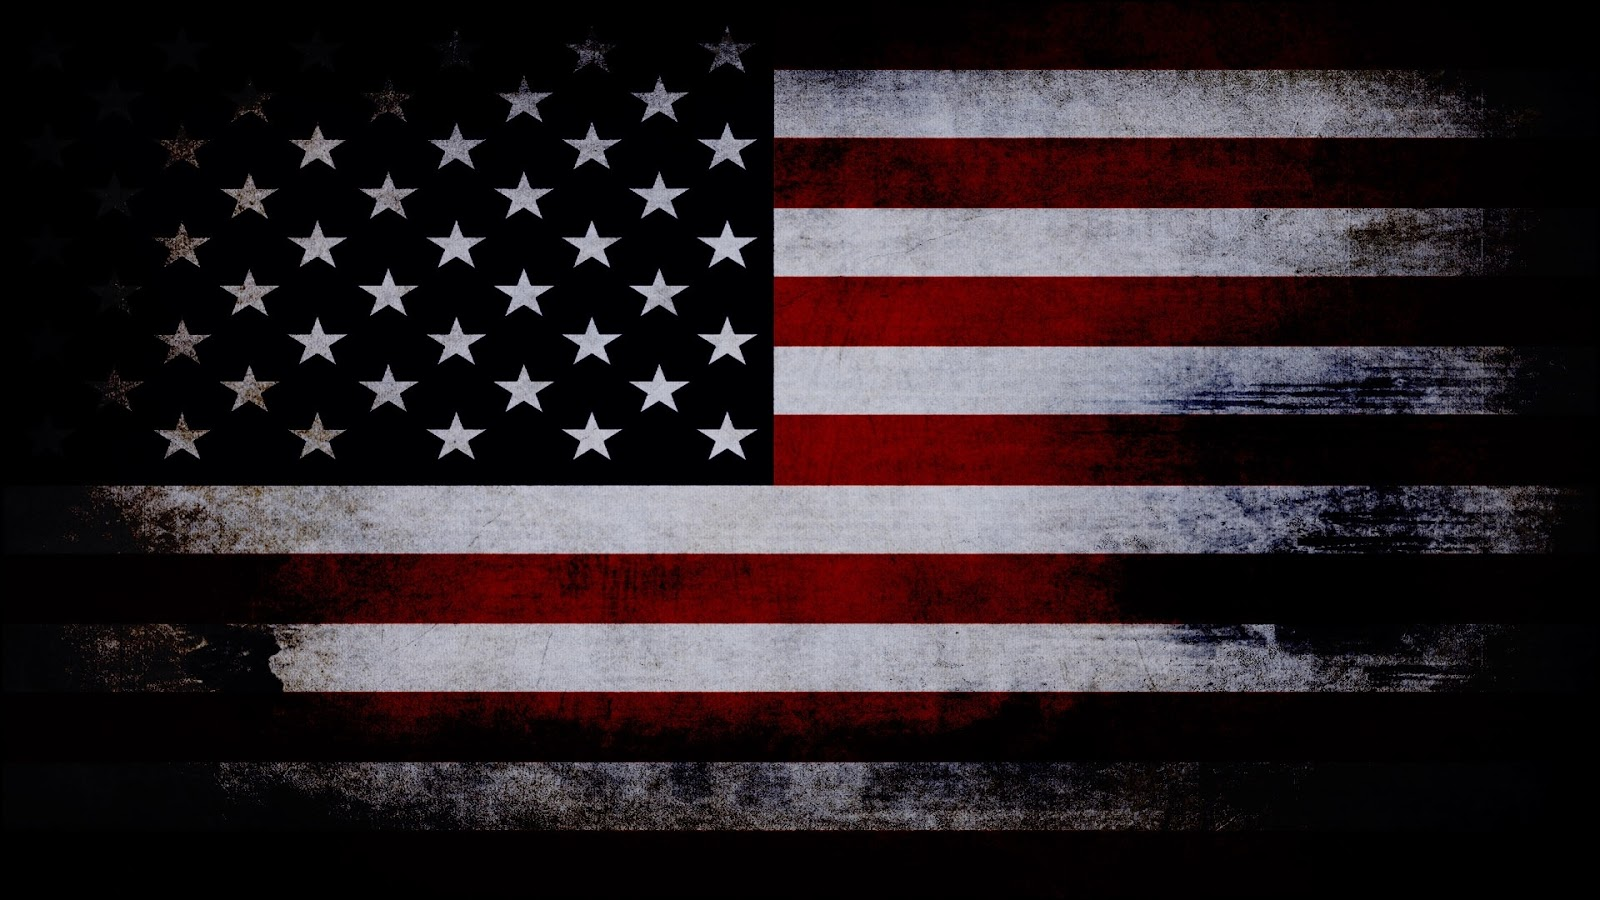 old american flag wallpaper hd wallpapersjpg 1600x900